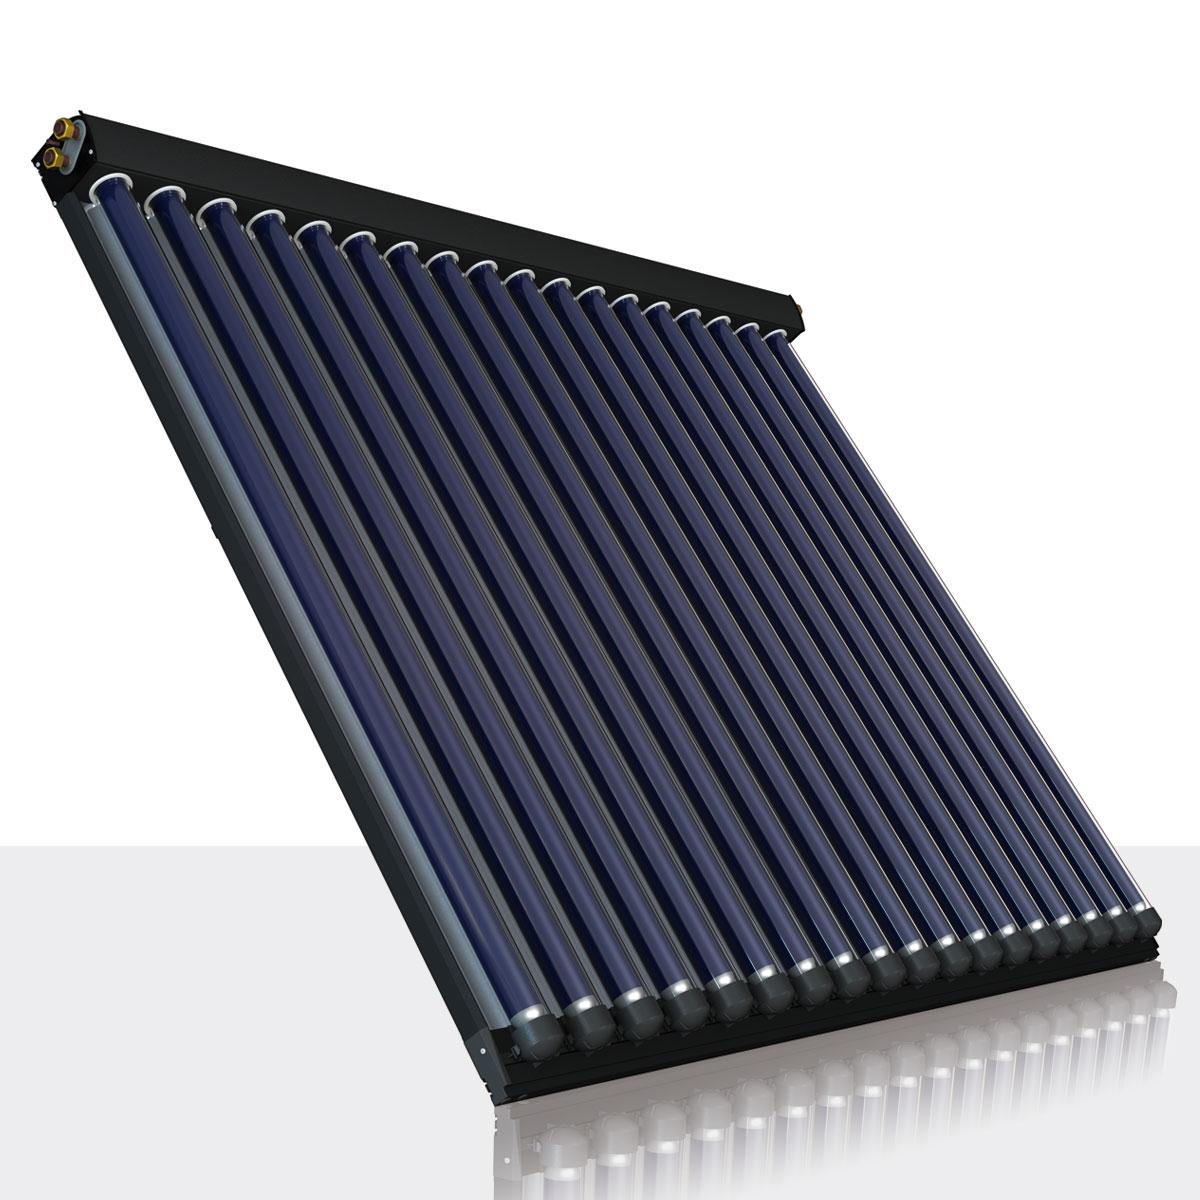 Vacuum Tube Solar Collectors Cpc Nero 93 Del Sol Electrical Wiring Diagram